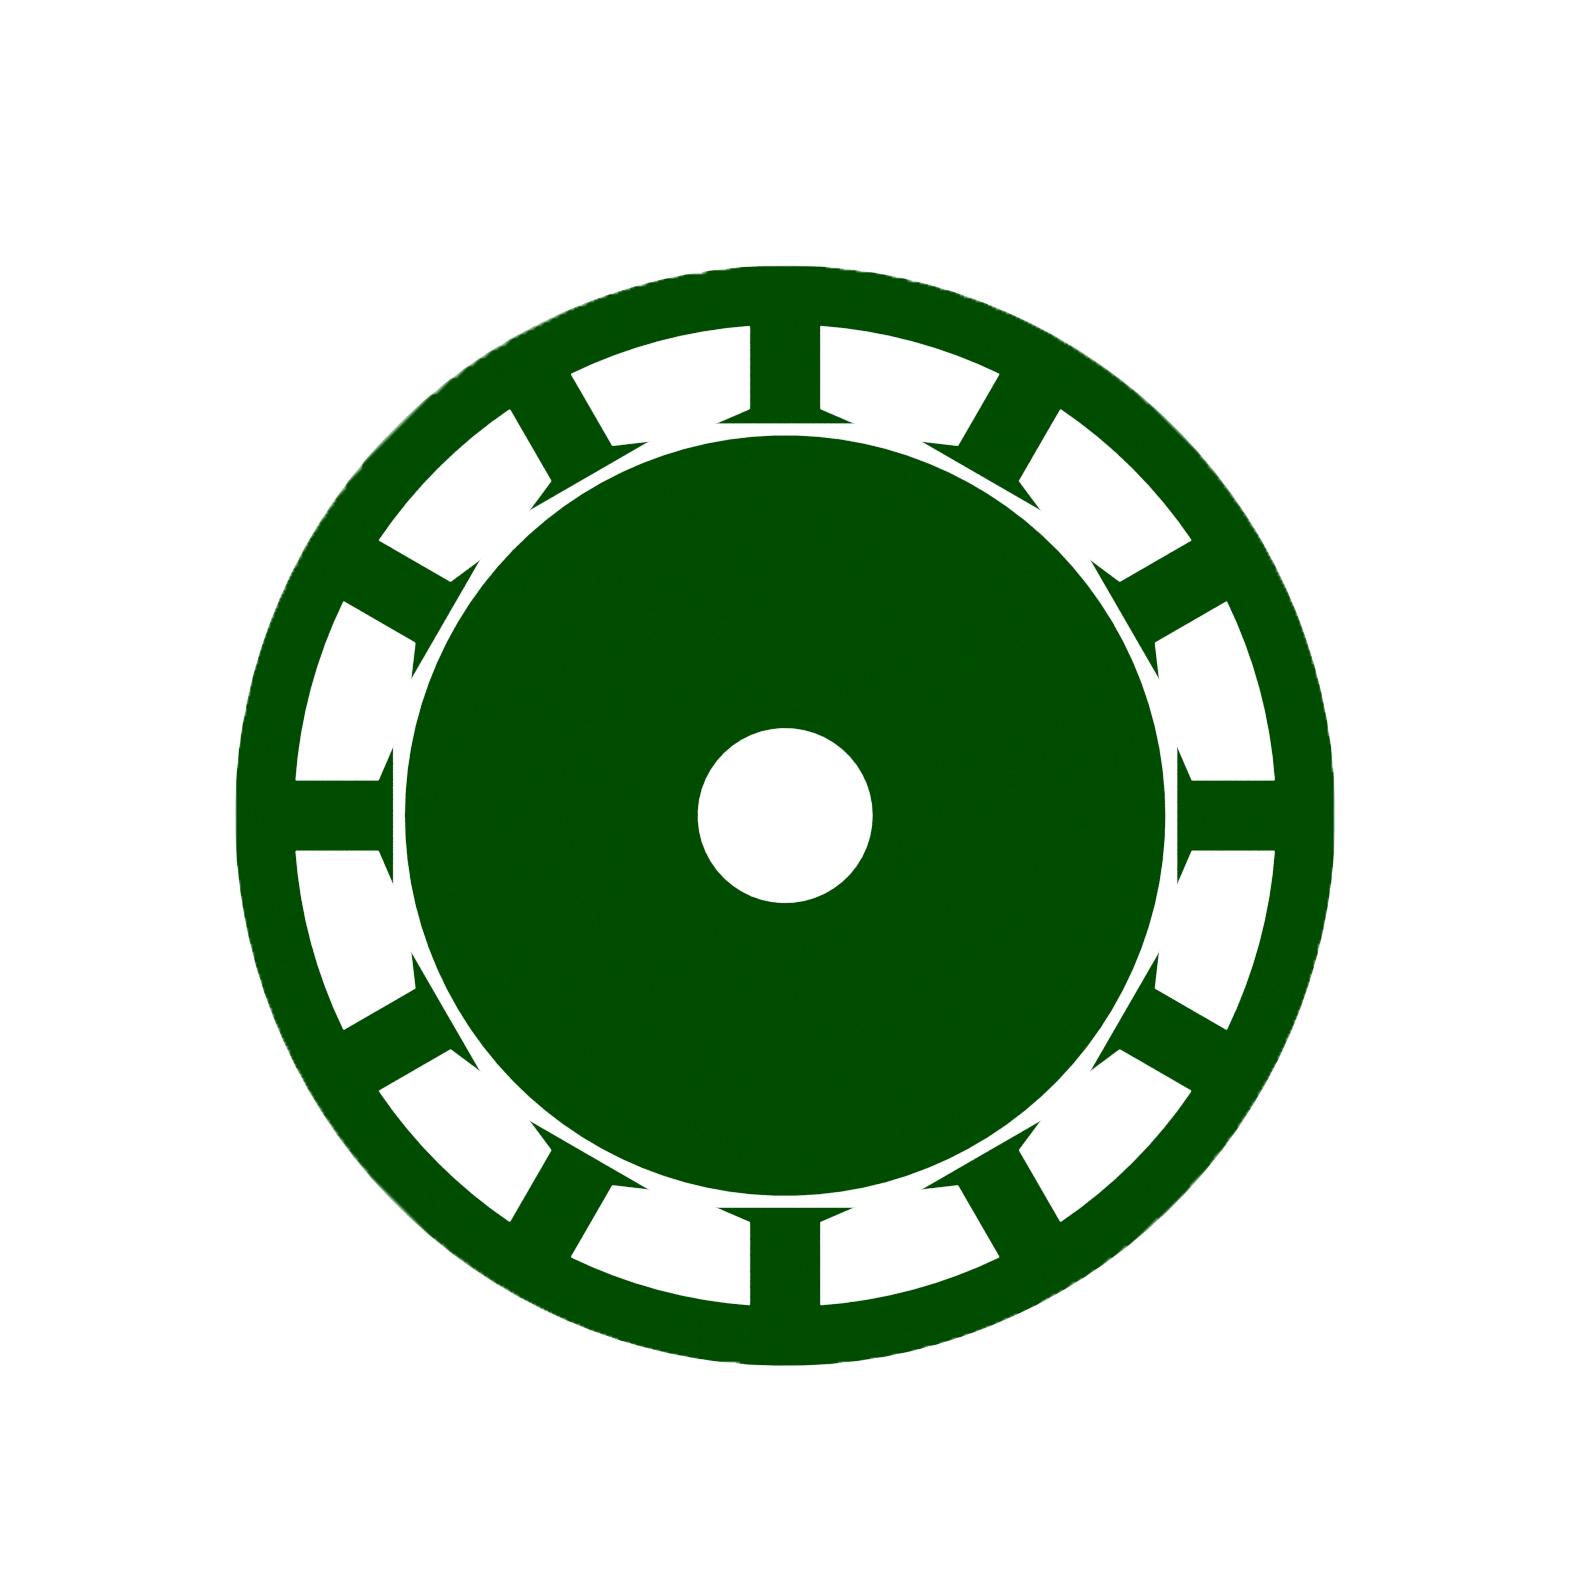 https://advancedelectricmachines.com/wp-content/uploads/2020/08/AEM-Logo-no-text.png